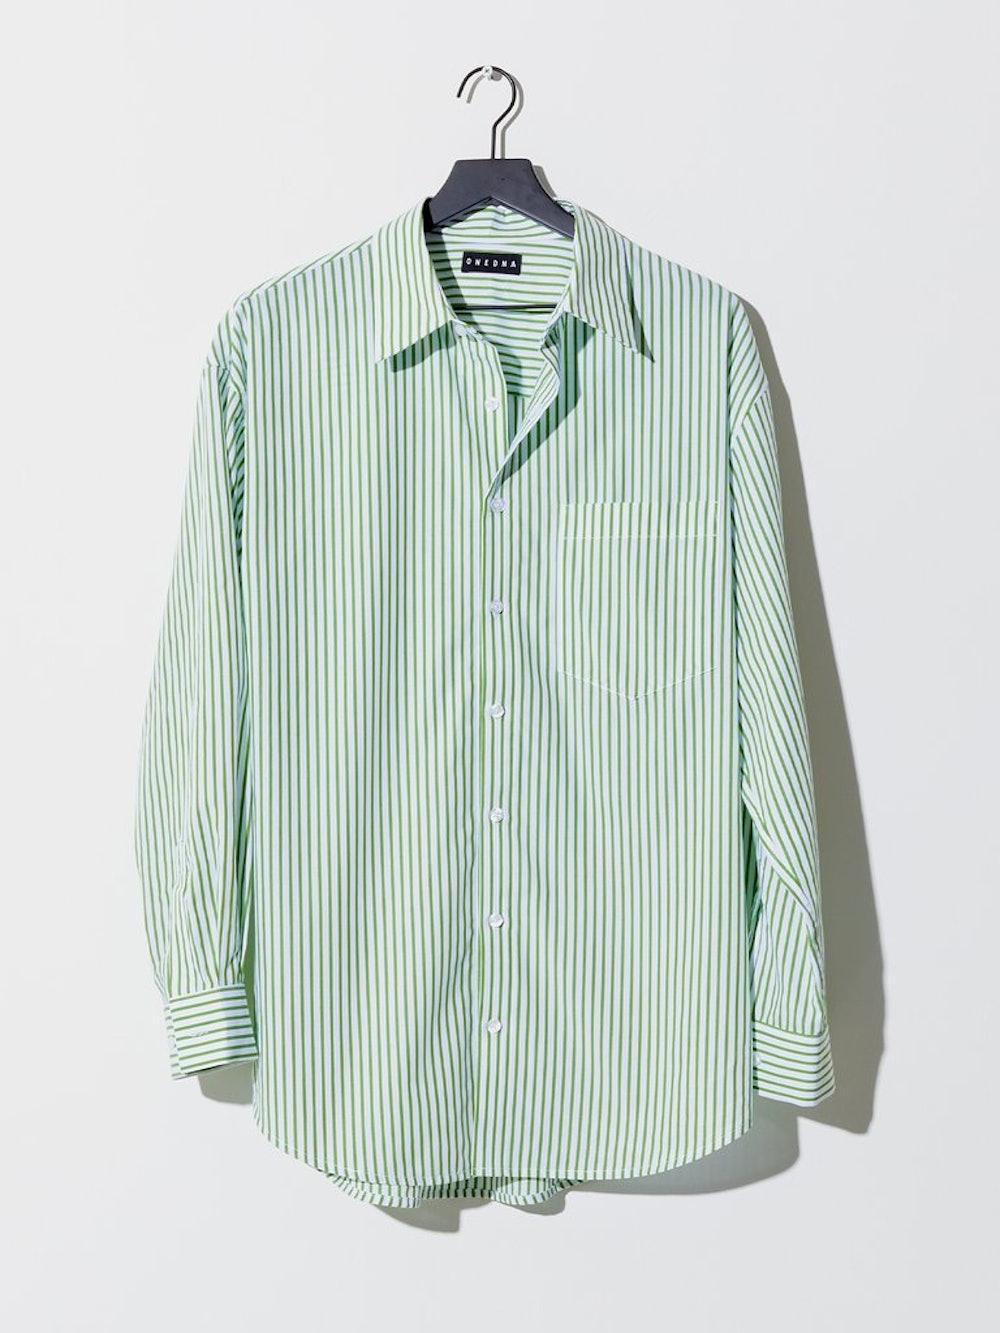 Resort Shirt in Green Stripe